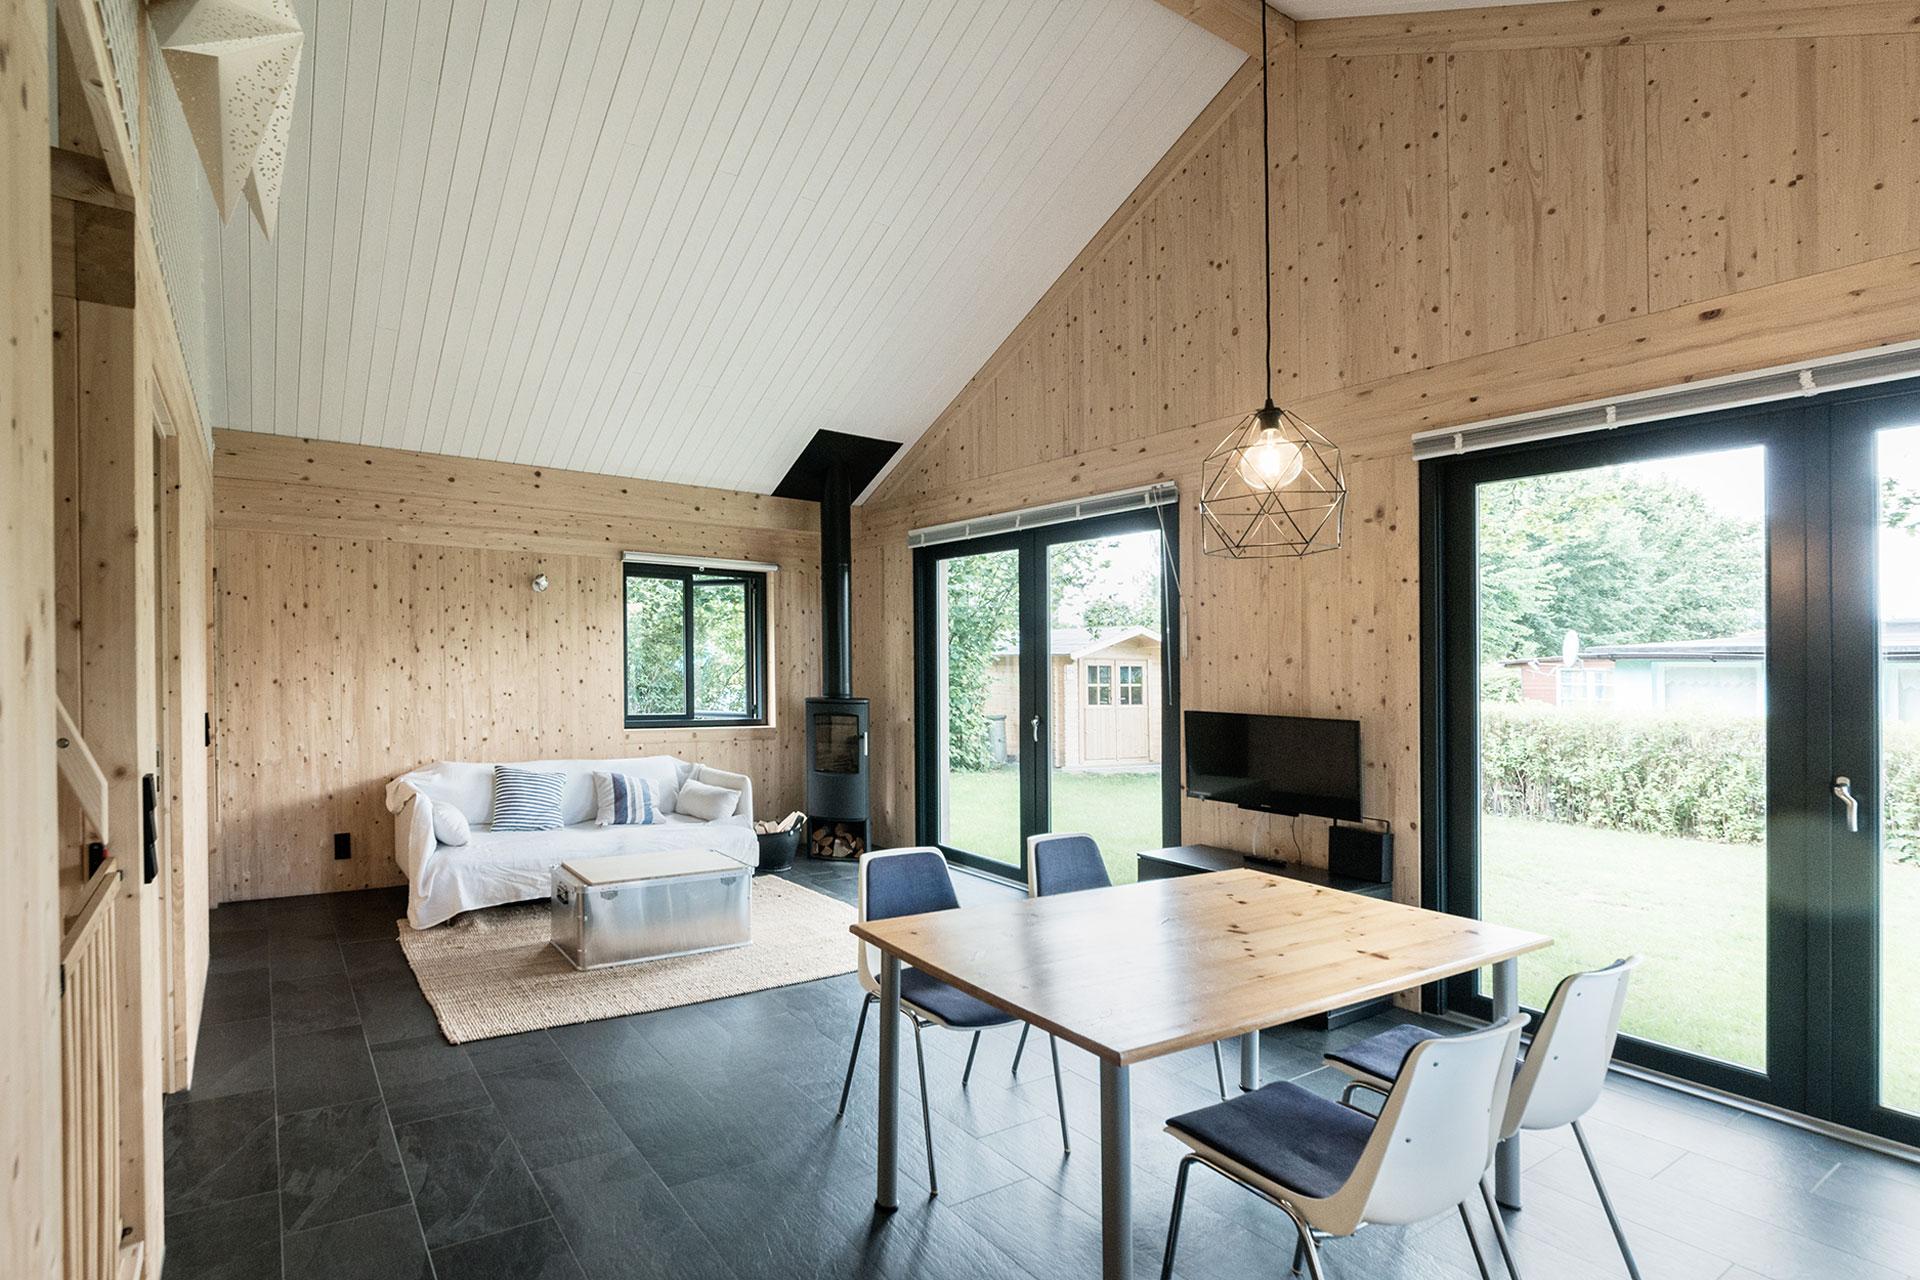 Ferienhaus im Landkreis NWM (01) / Totale Innen